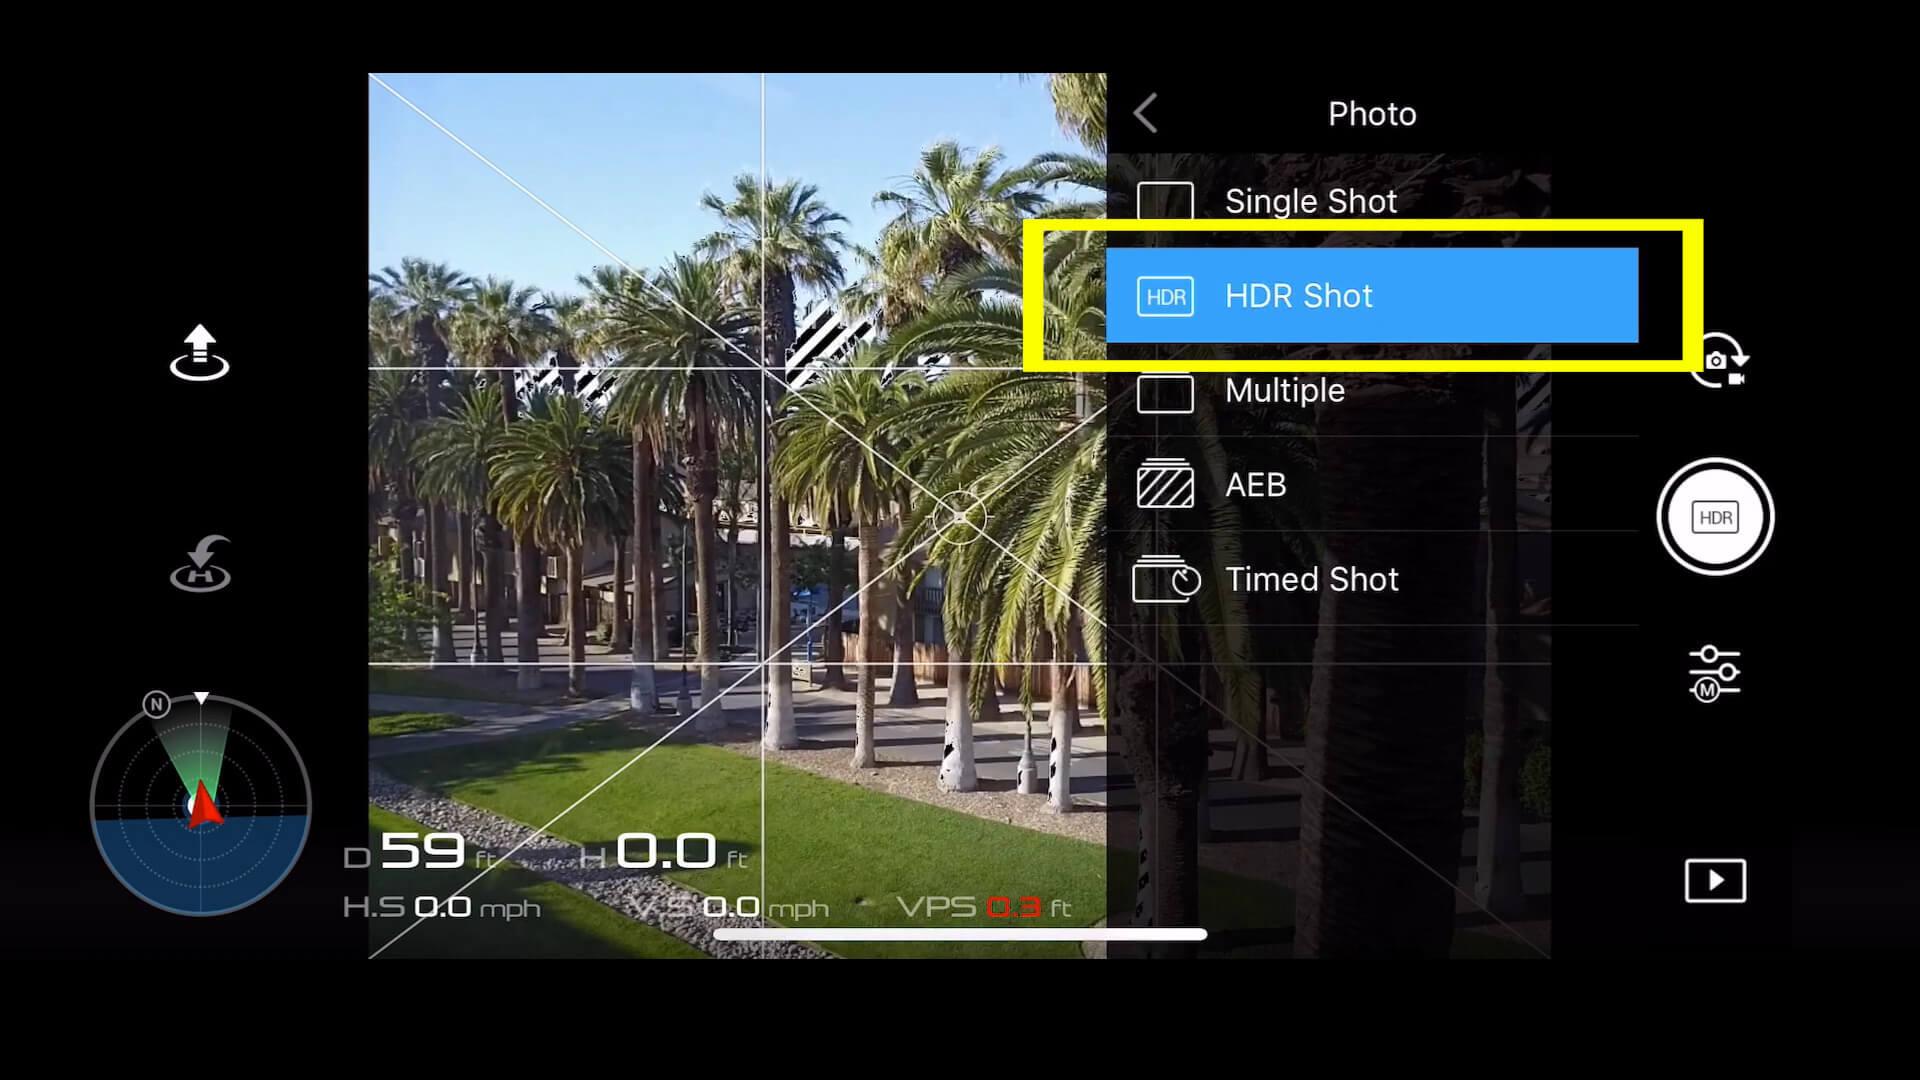 18 basic camera settings for dji drone photos - HDR